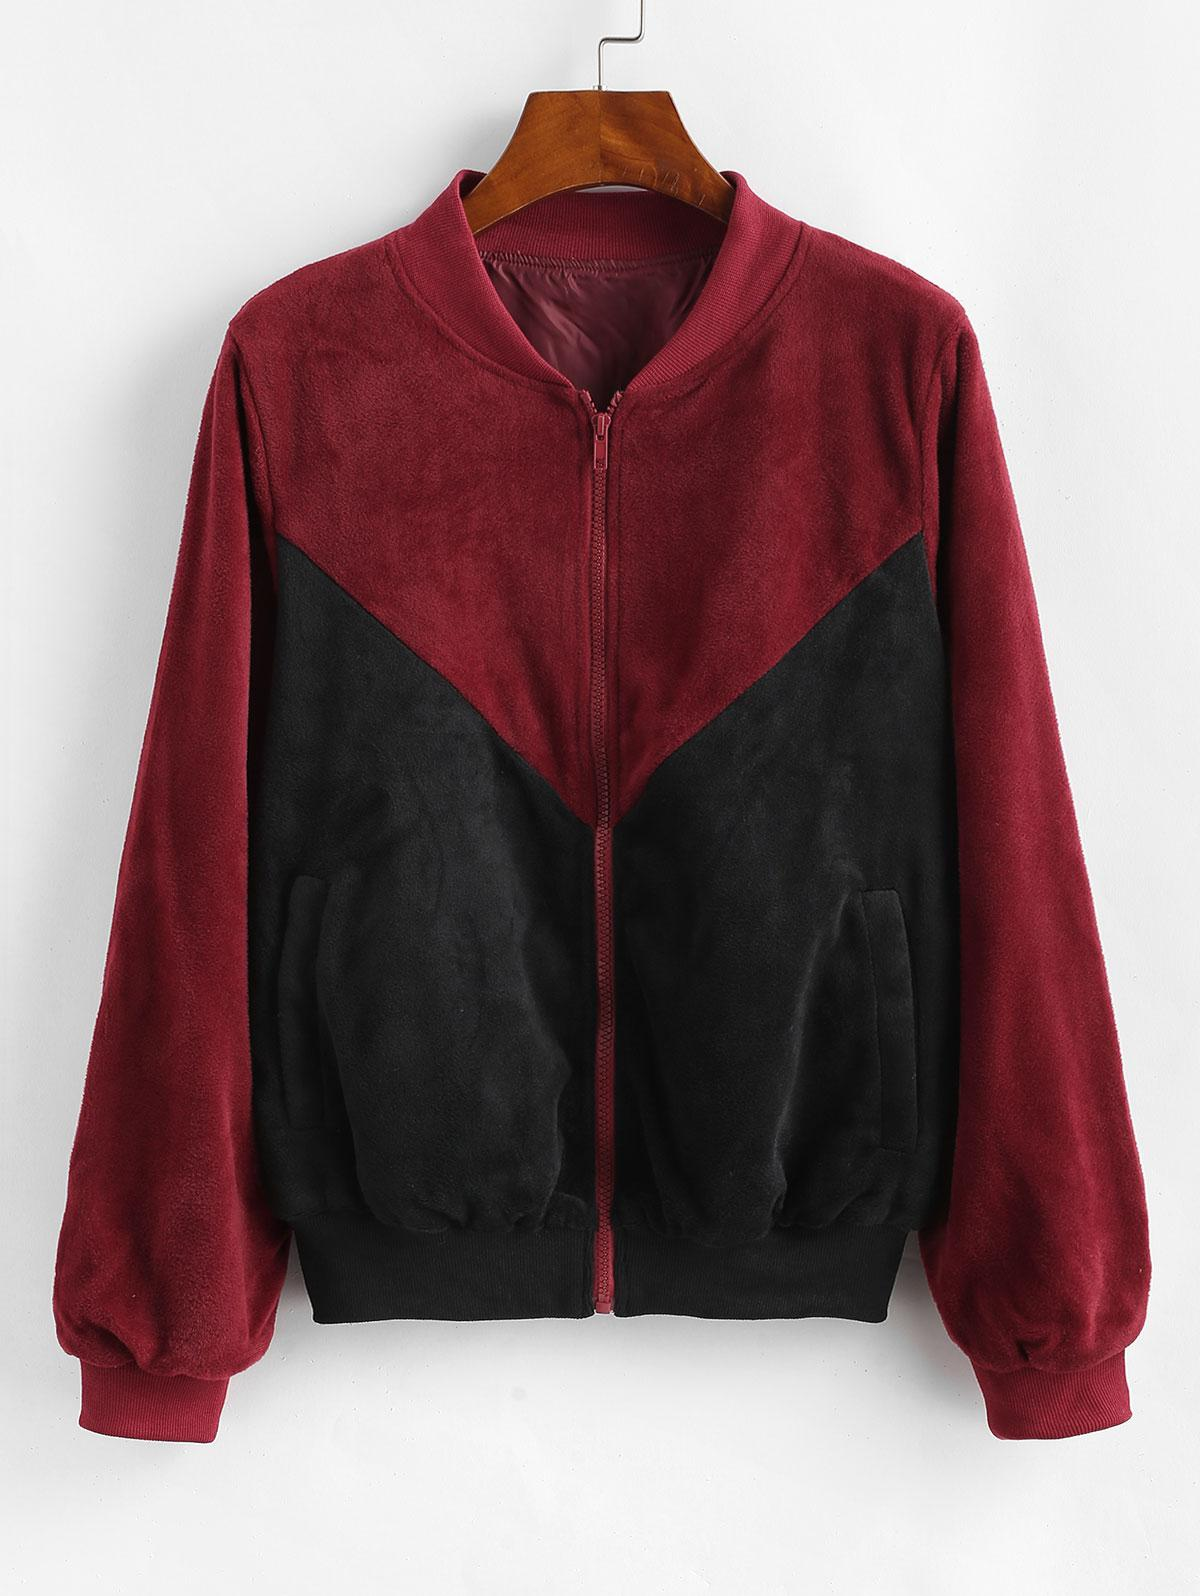 ZAFUL Velvet Color Block Jacket